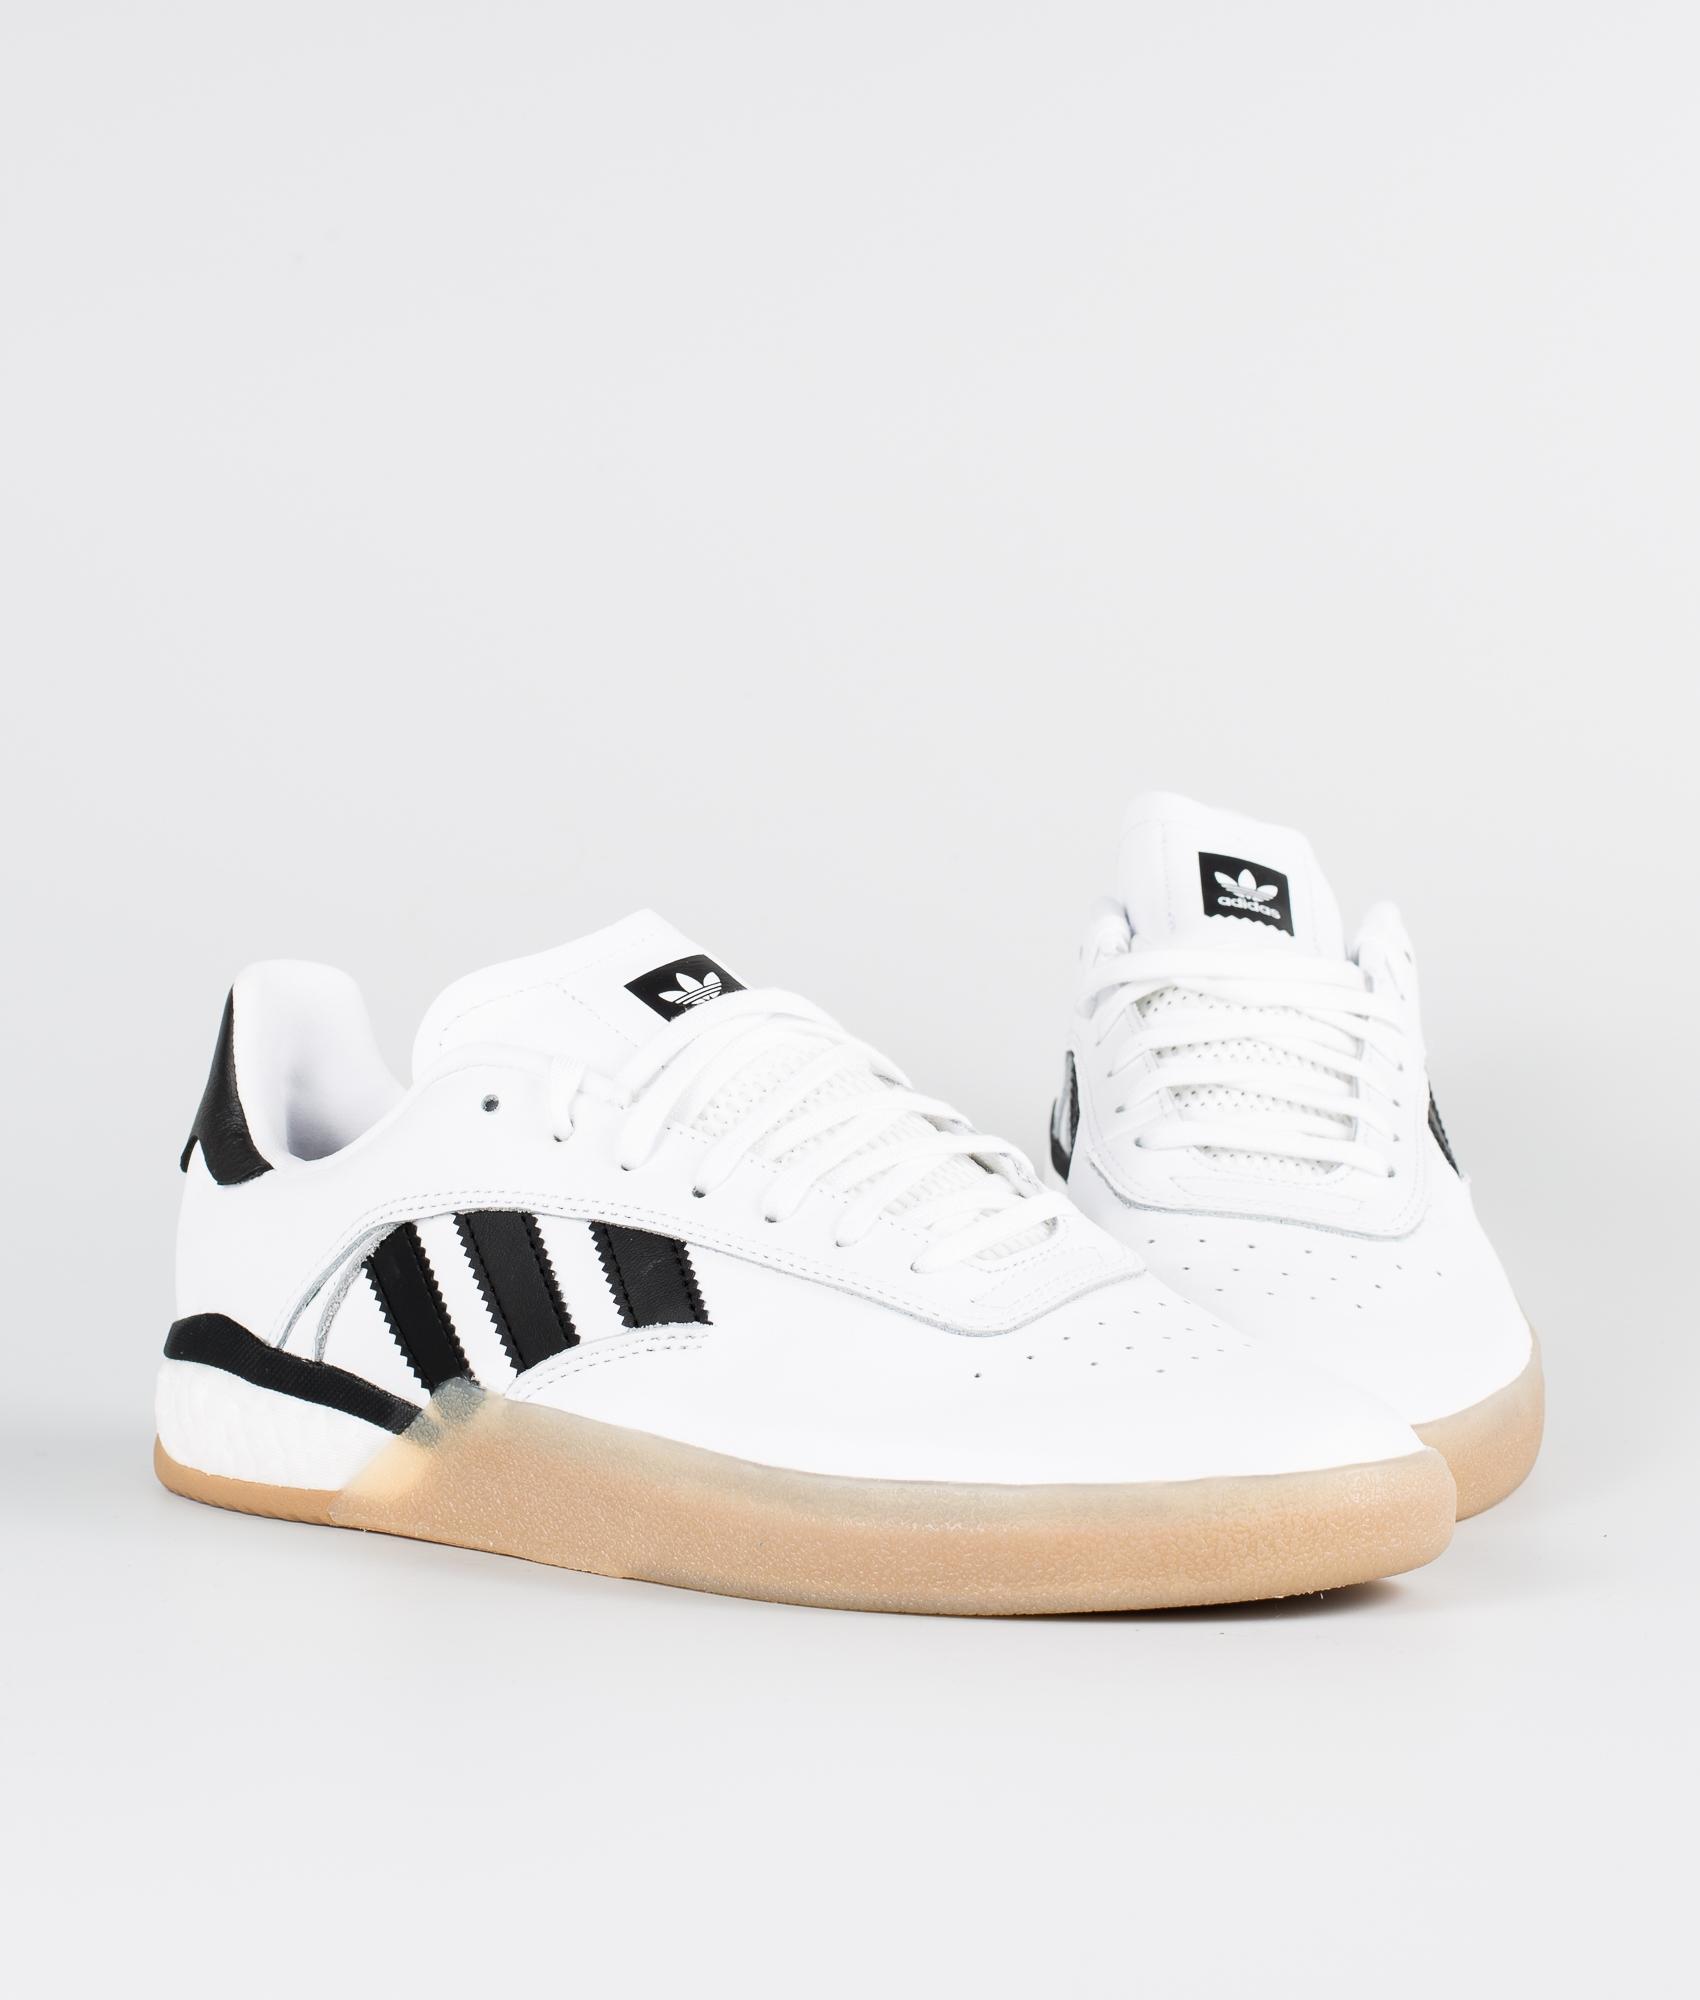 Adidas Skateboarding 3St.004 Sko Ftwr WhiteCore BlackGum4